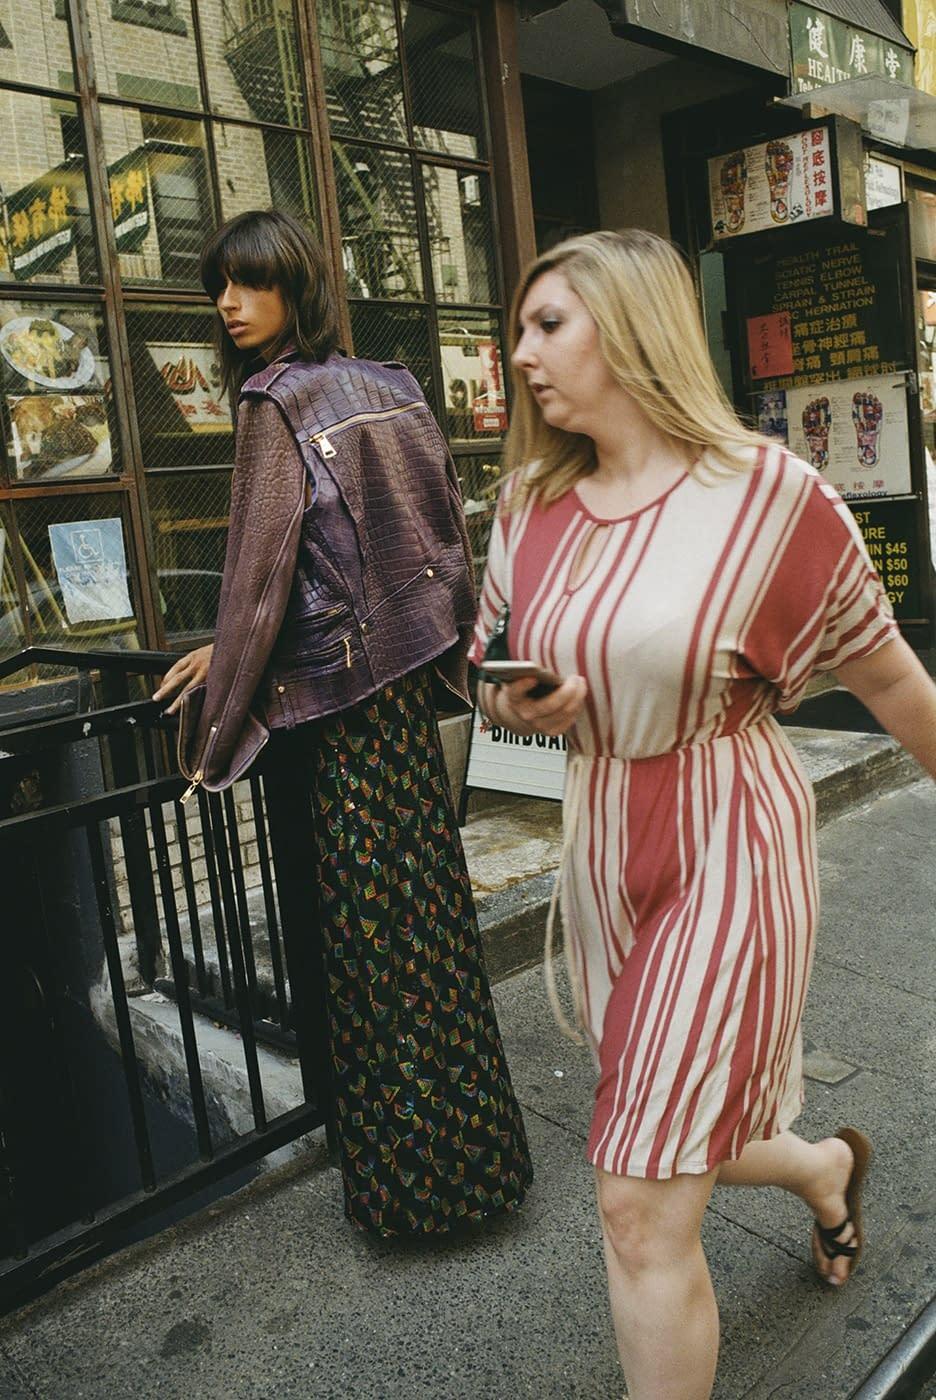 New York Stories 1 photo Enric Galceran - 10